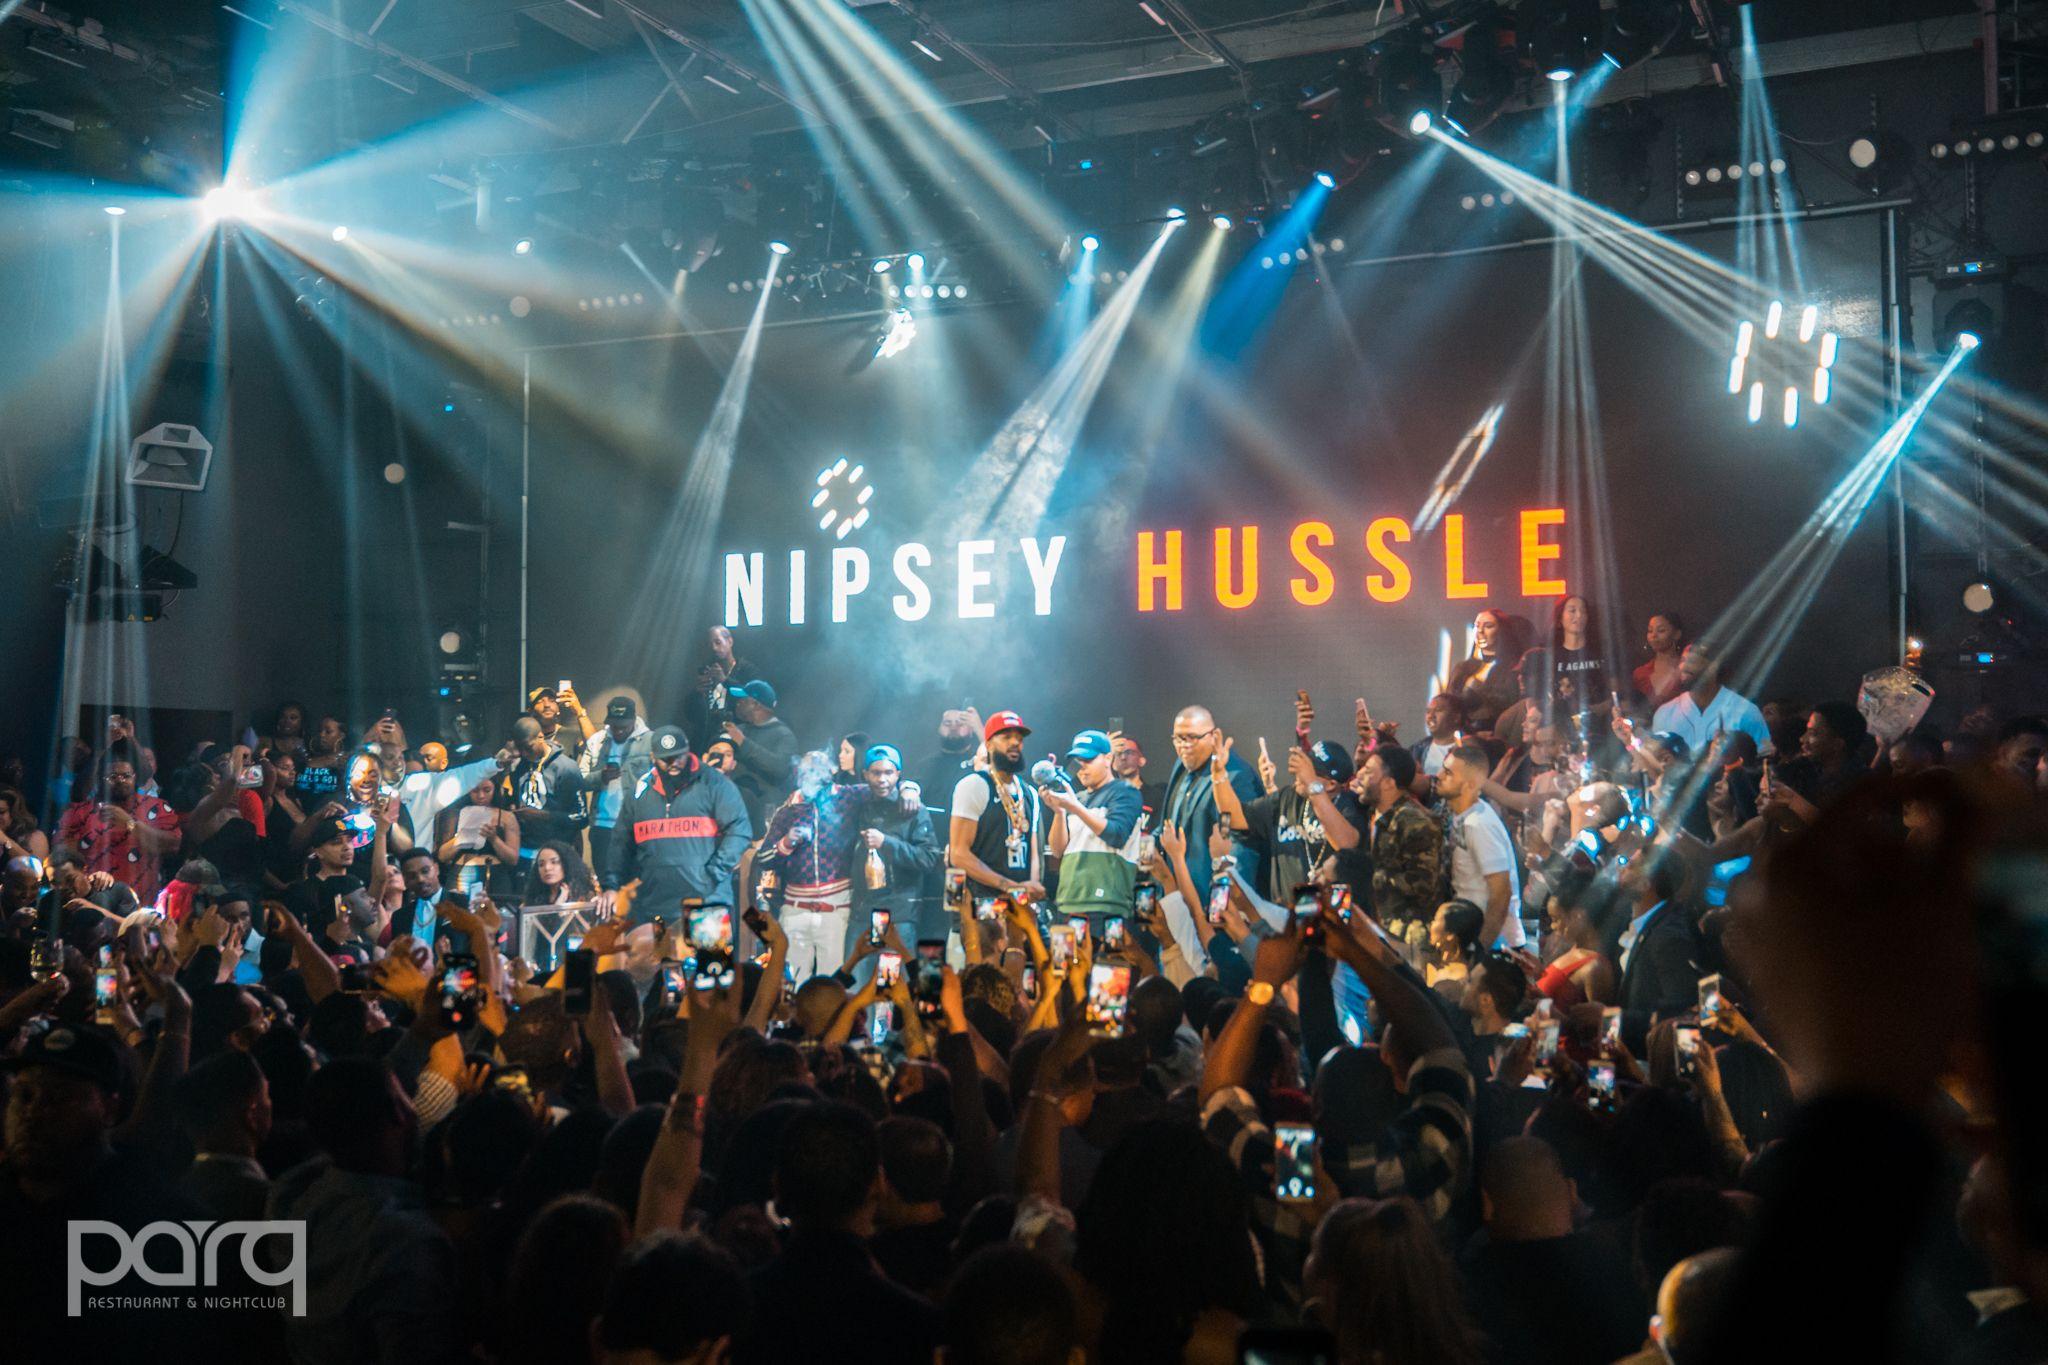 03.09.18 Parq - Nipsey Hussle-18.jpg